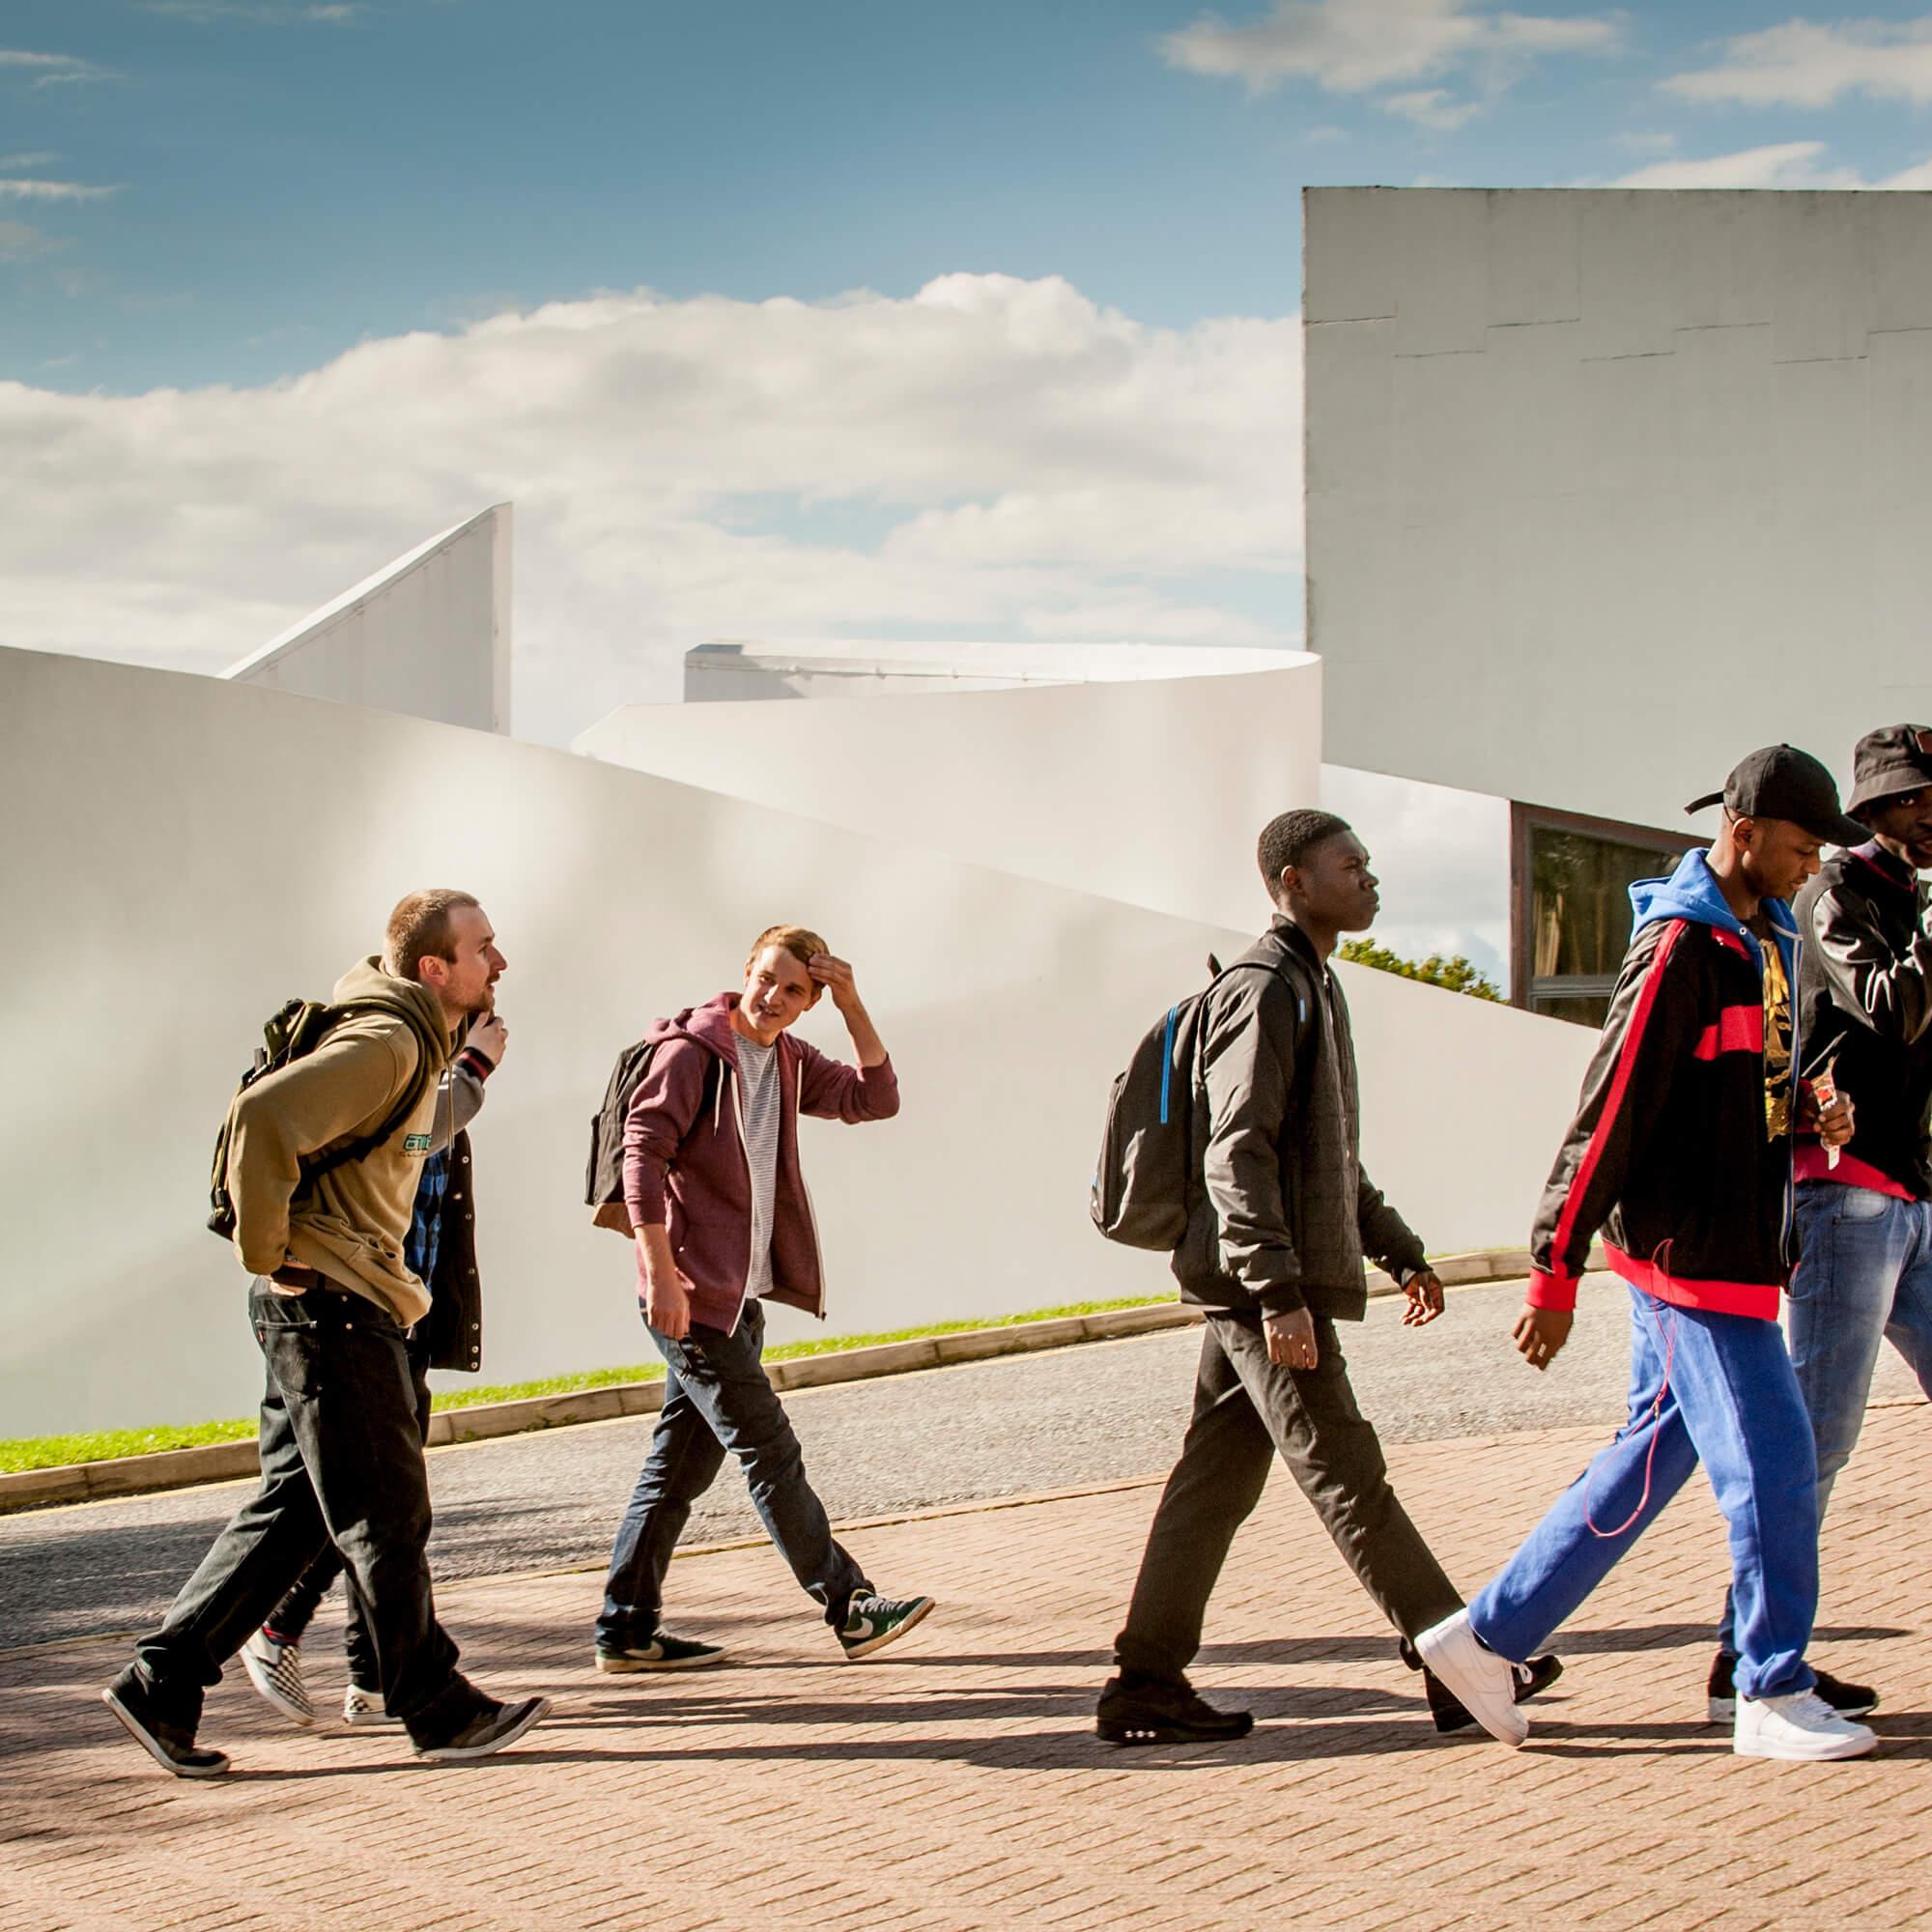 Students walking towards the University's main entrance